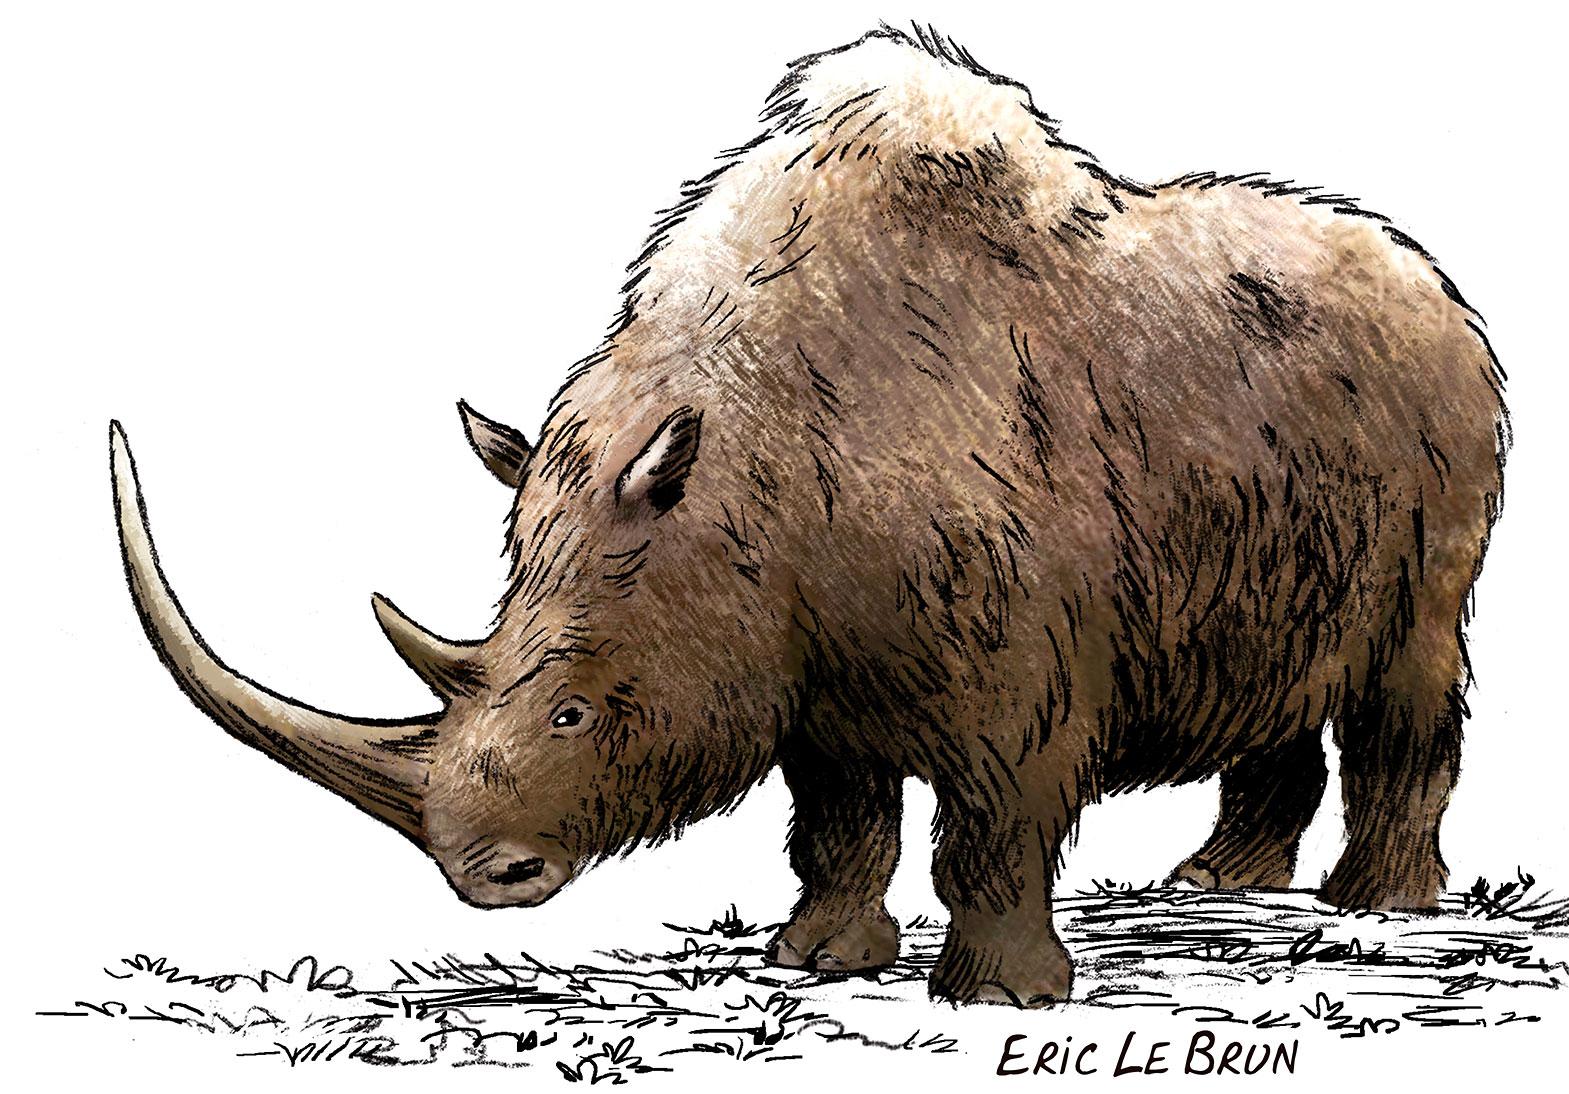 Le rhinoc ros laineux hominid s - Rhinoceros dessin ...